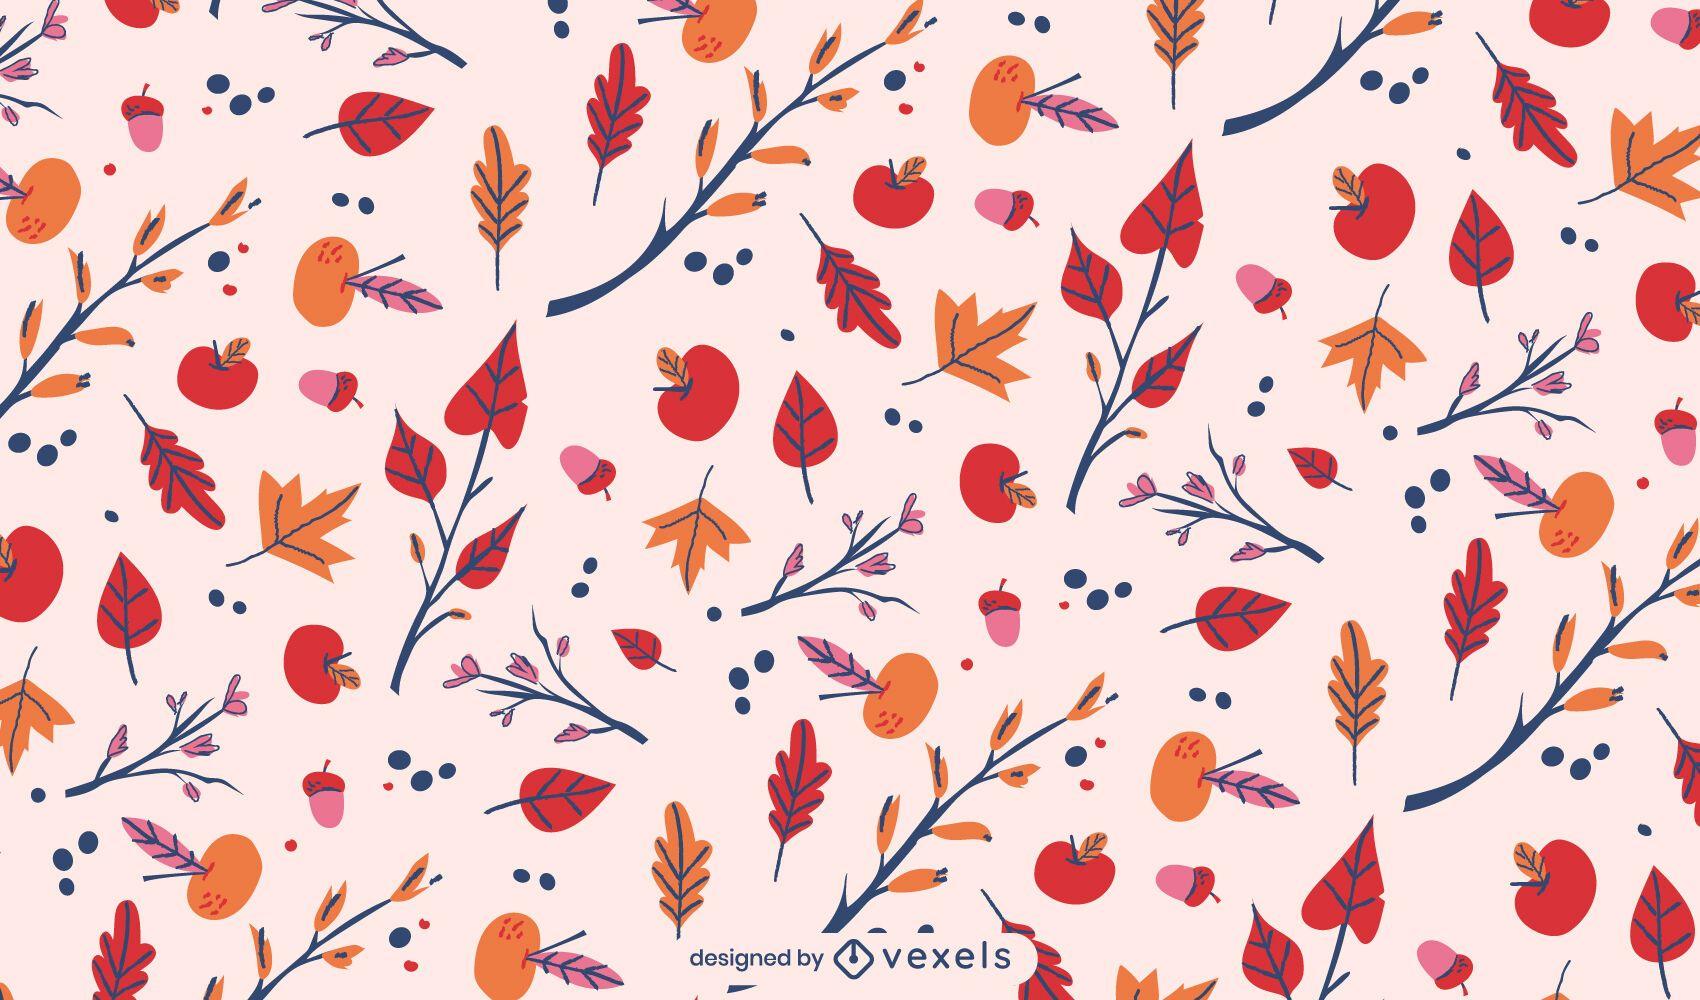 Autumn leaves nature pattern design